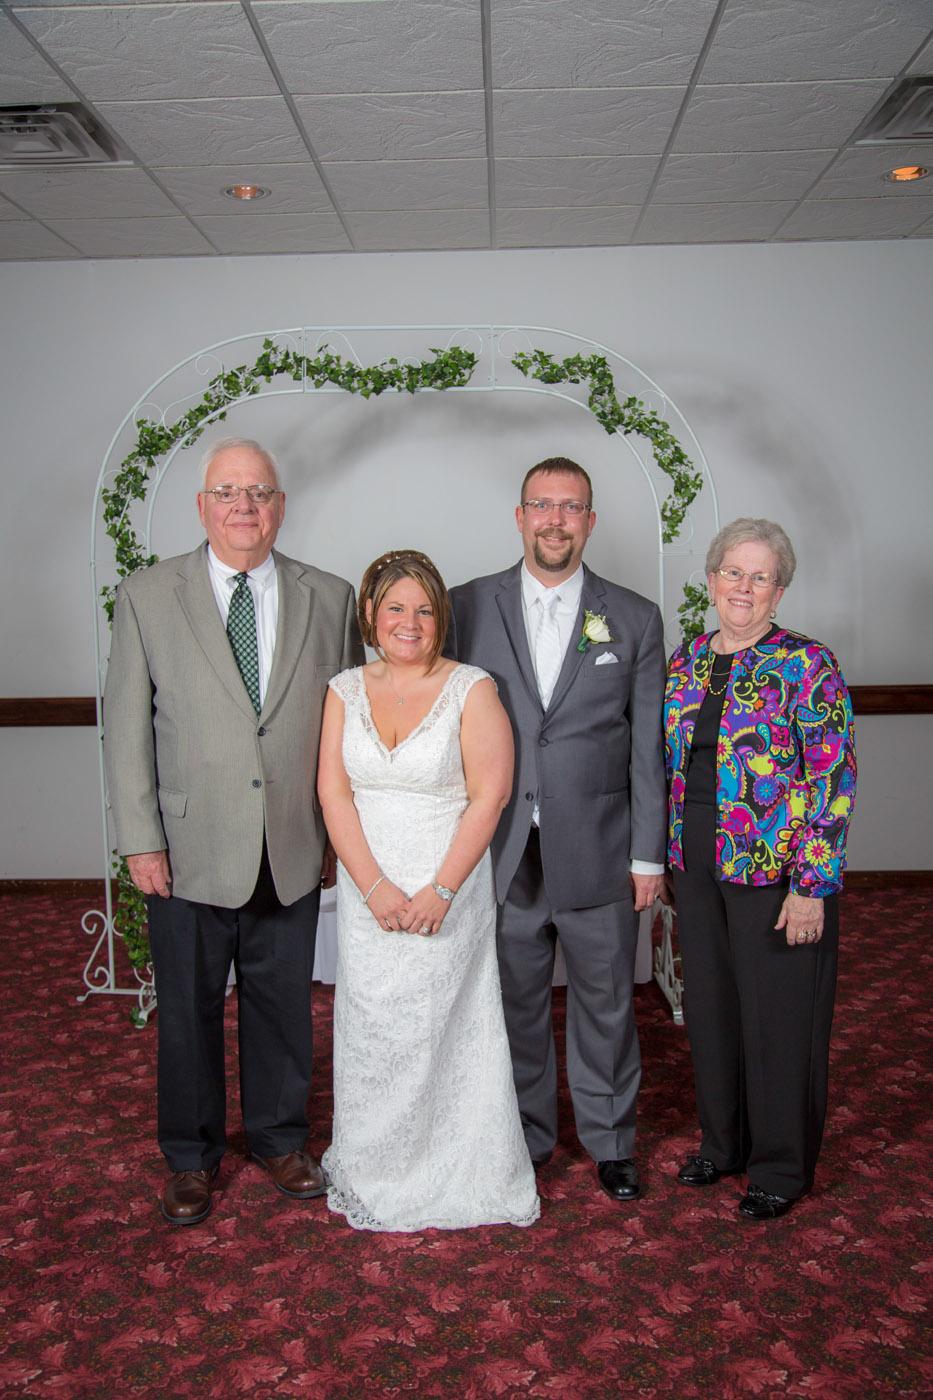 Healy Wedding 1 1459.jpg